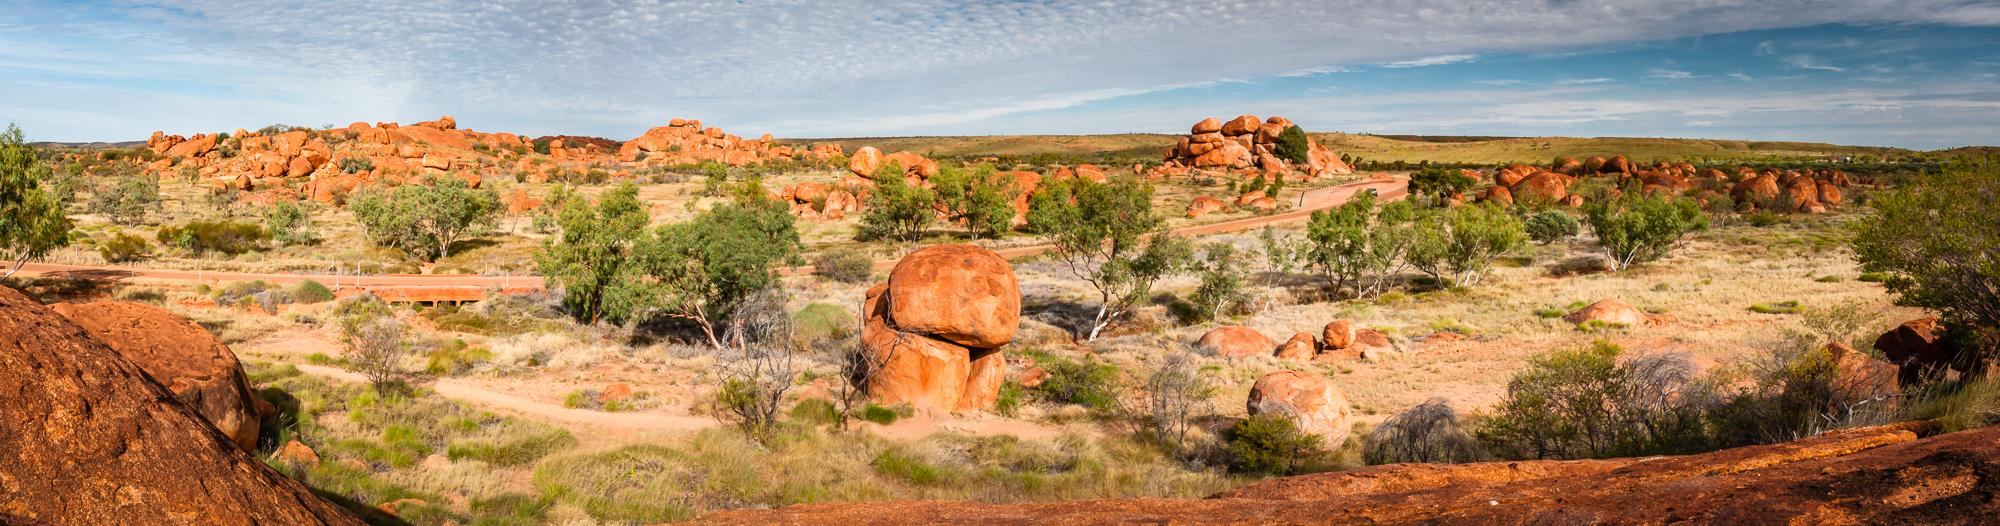 Devils Marbles Outback Australien